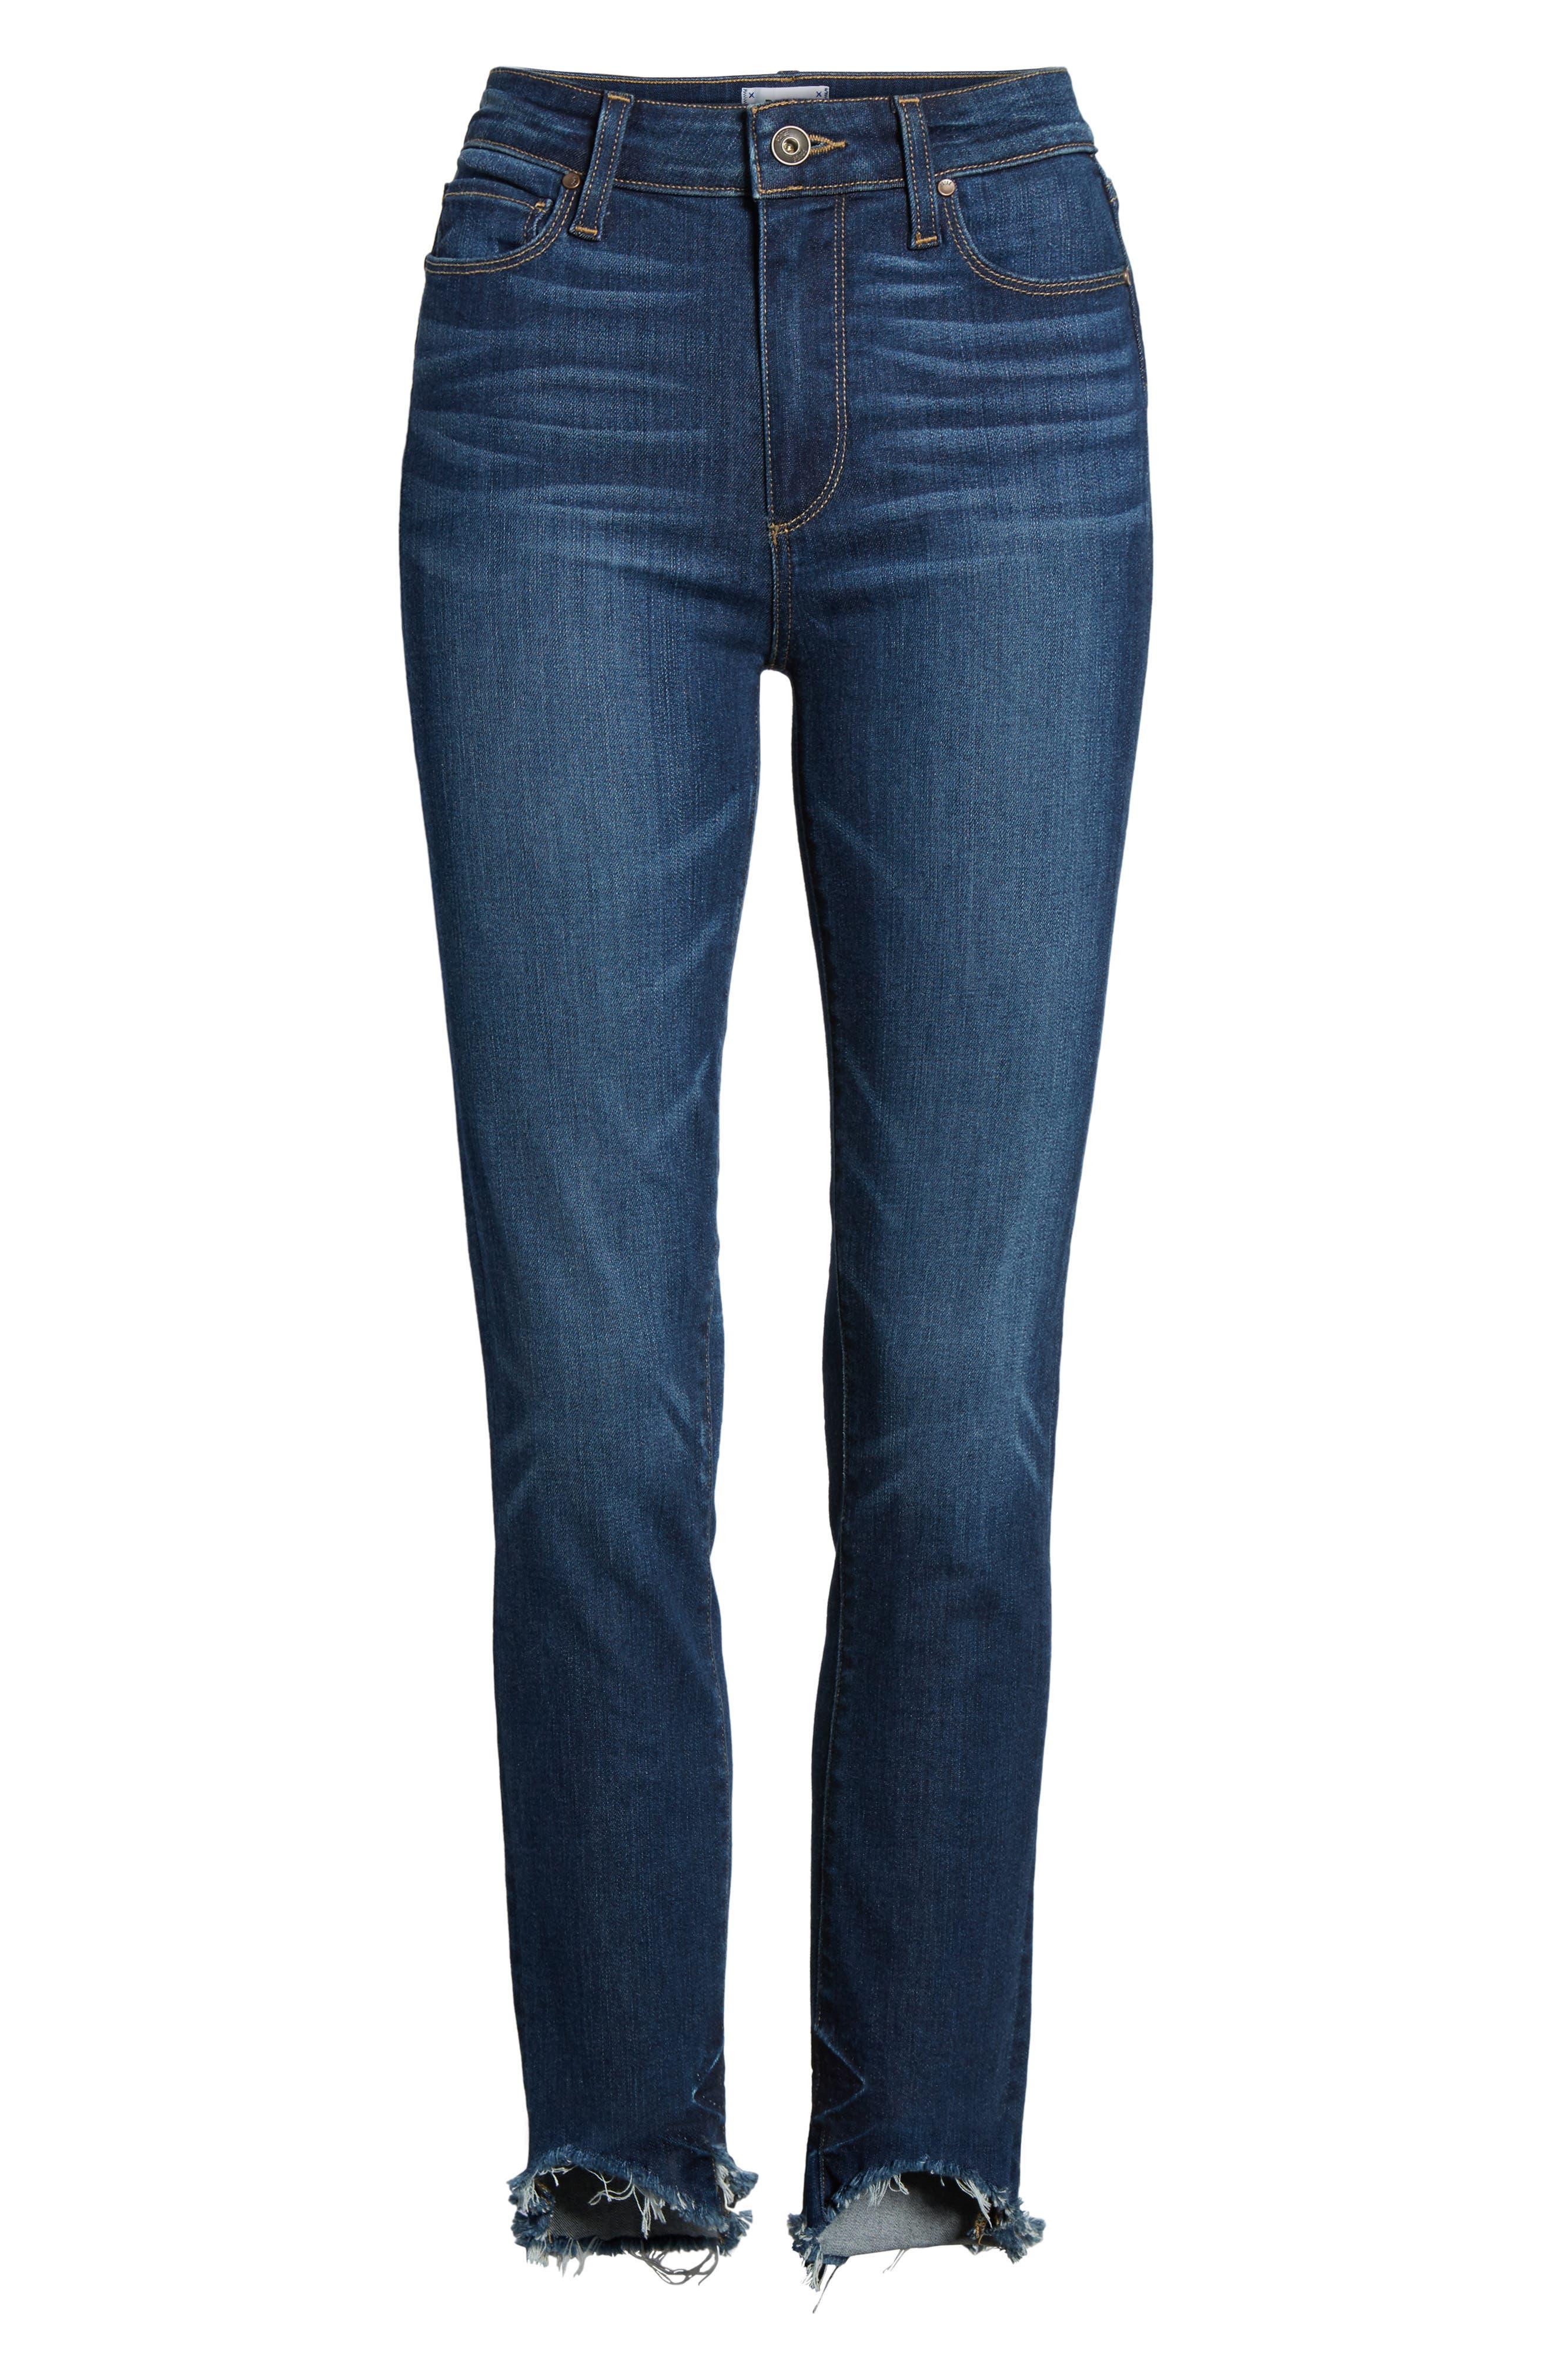 Transcend Vintage - Hoxton High Waist Ankle Skinny Jeans,                             Alternate thumbnail 6, color,                             Auburn